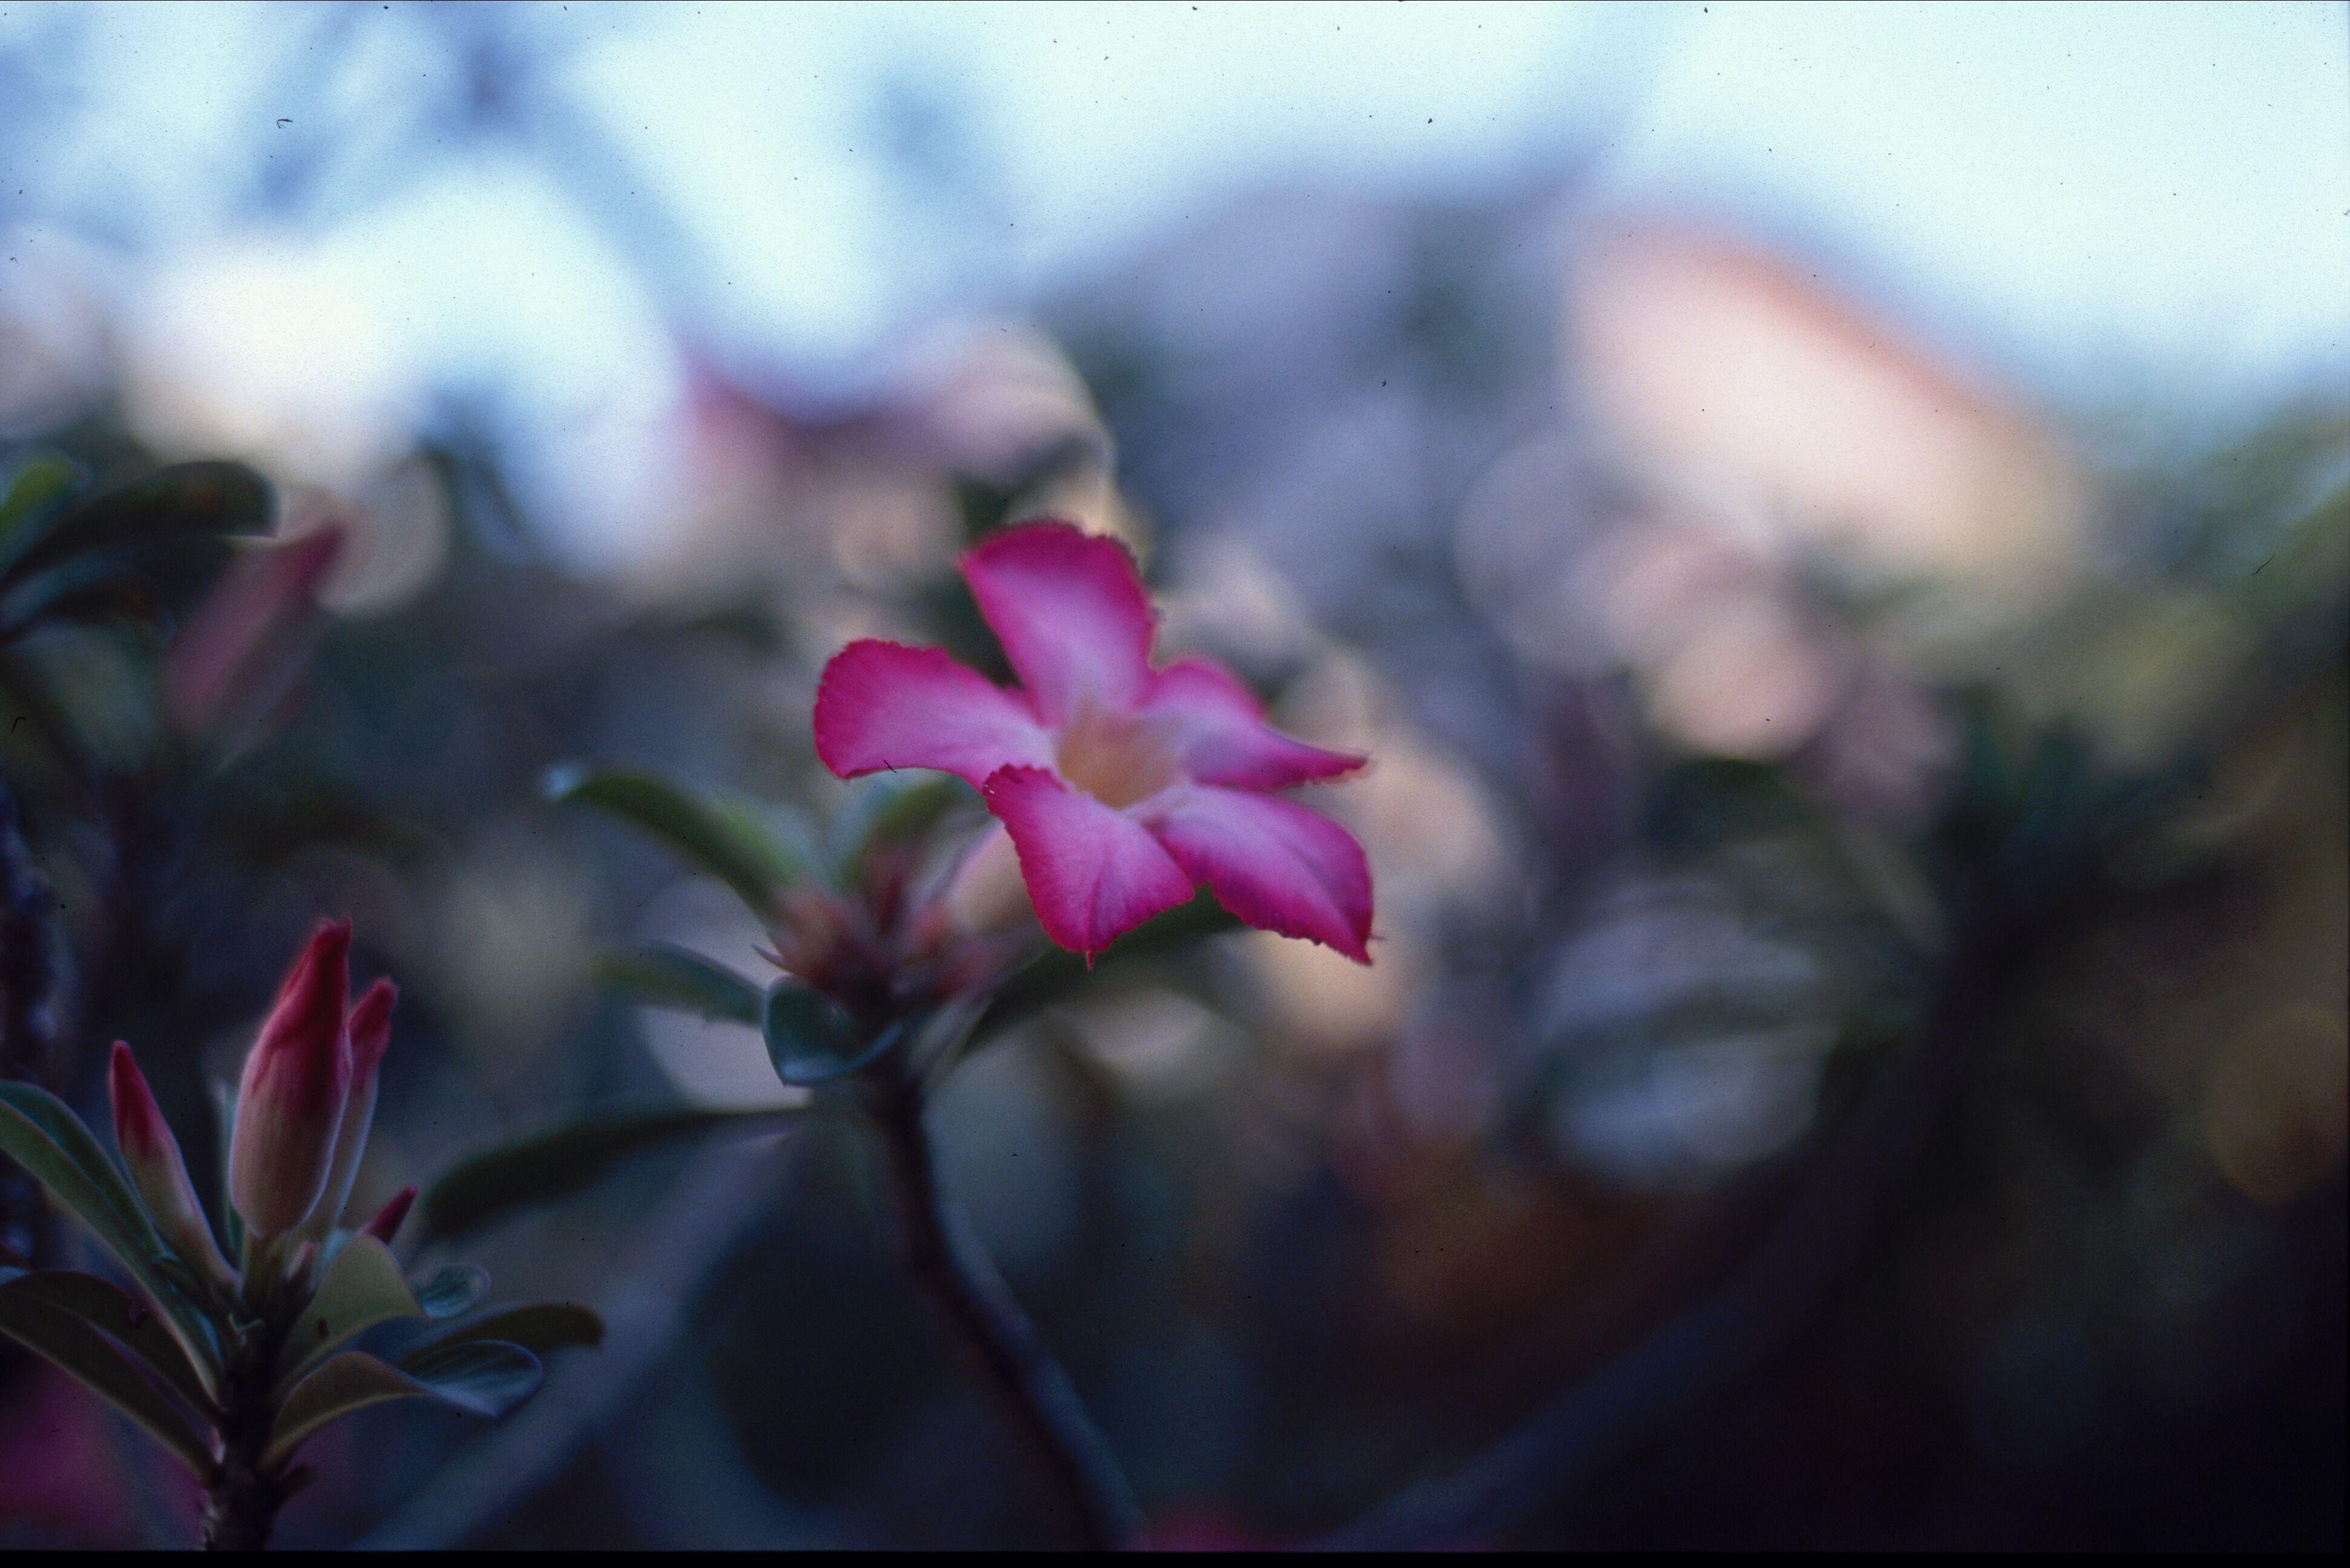 A Tropical Flower In Sri Lanka Tropical Flowers Flowers Plants